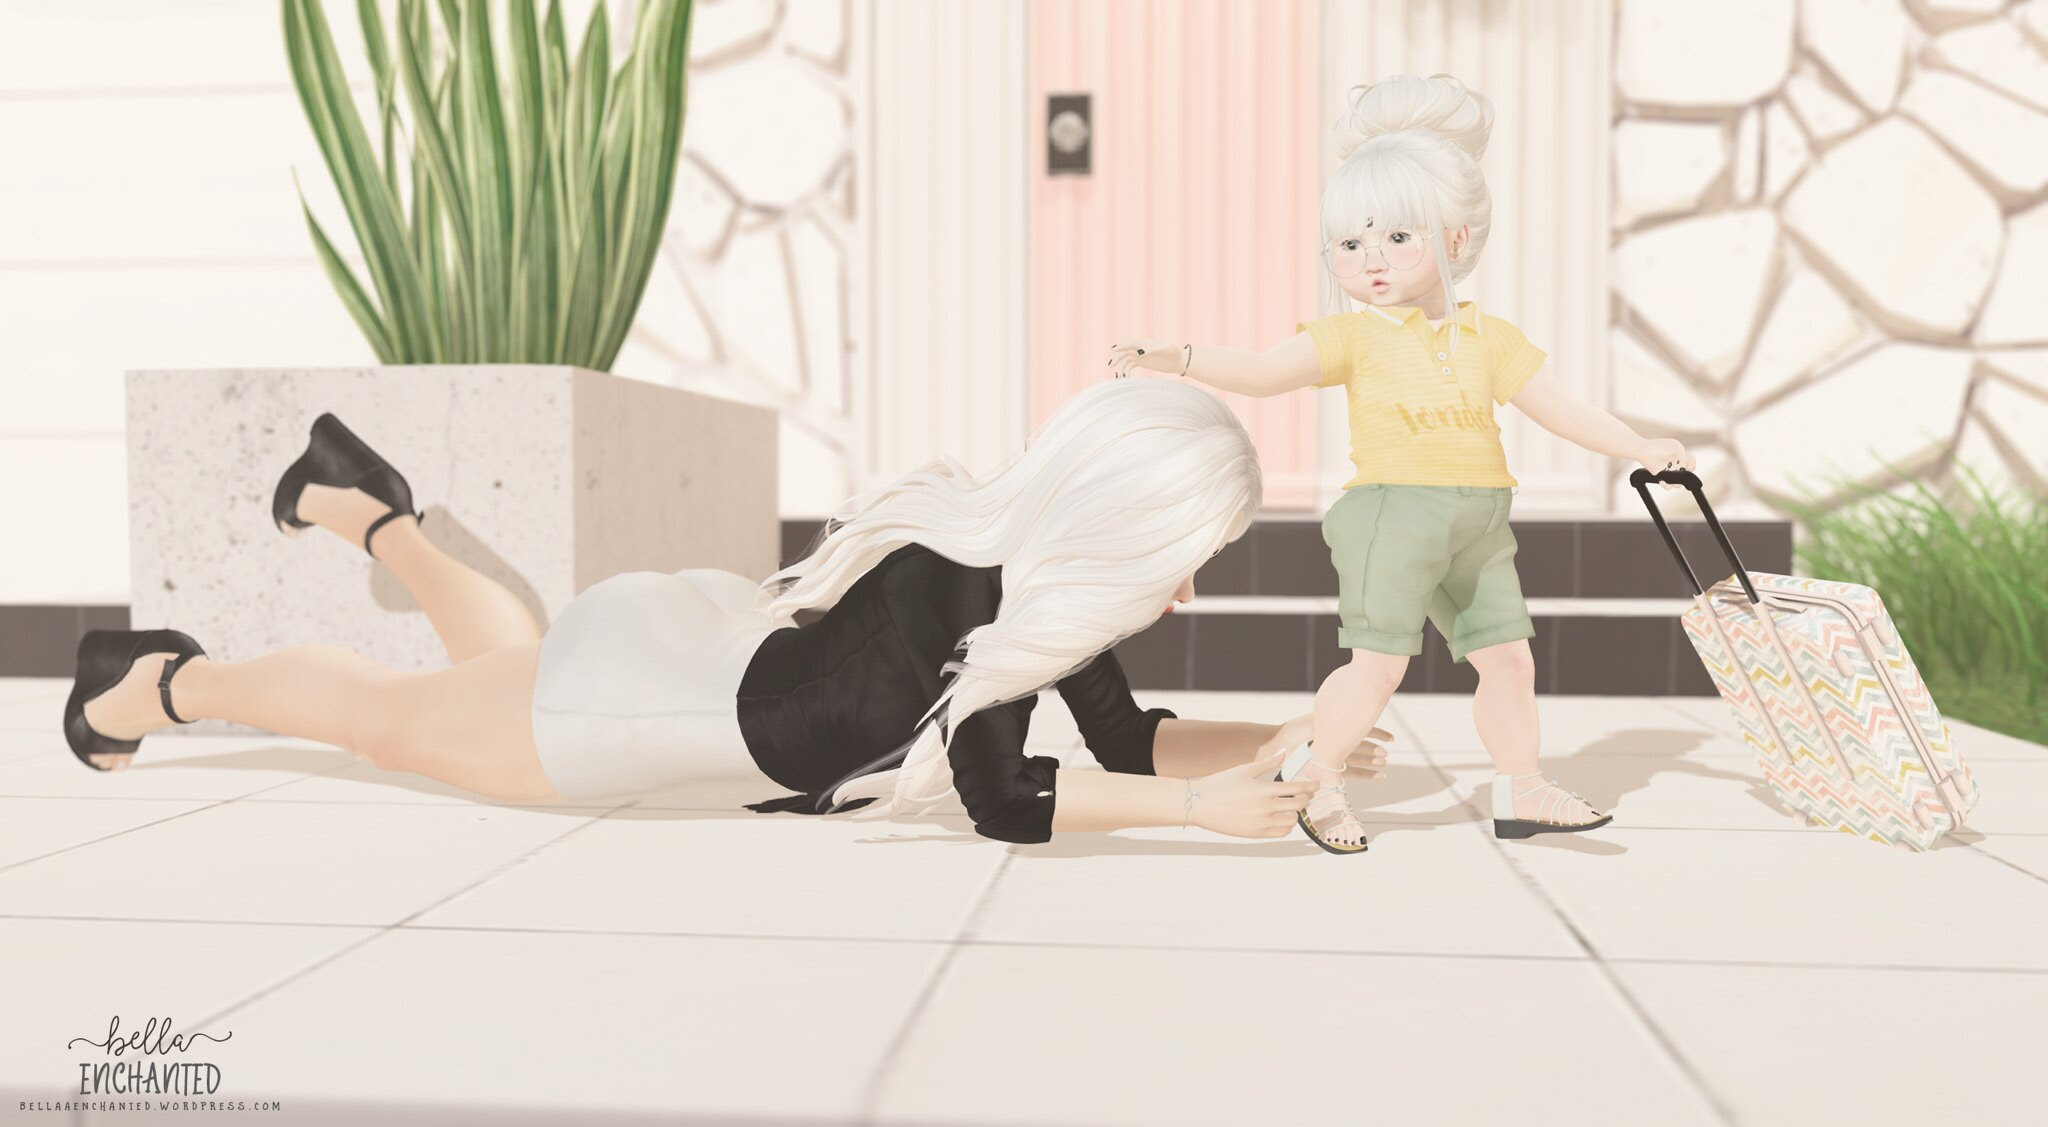 ʚ ⊱ Bella Enchanted ⊰ ɞ: Clingy Mama